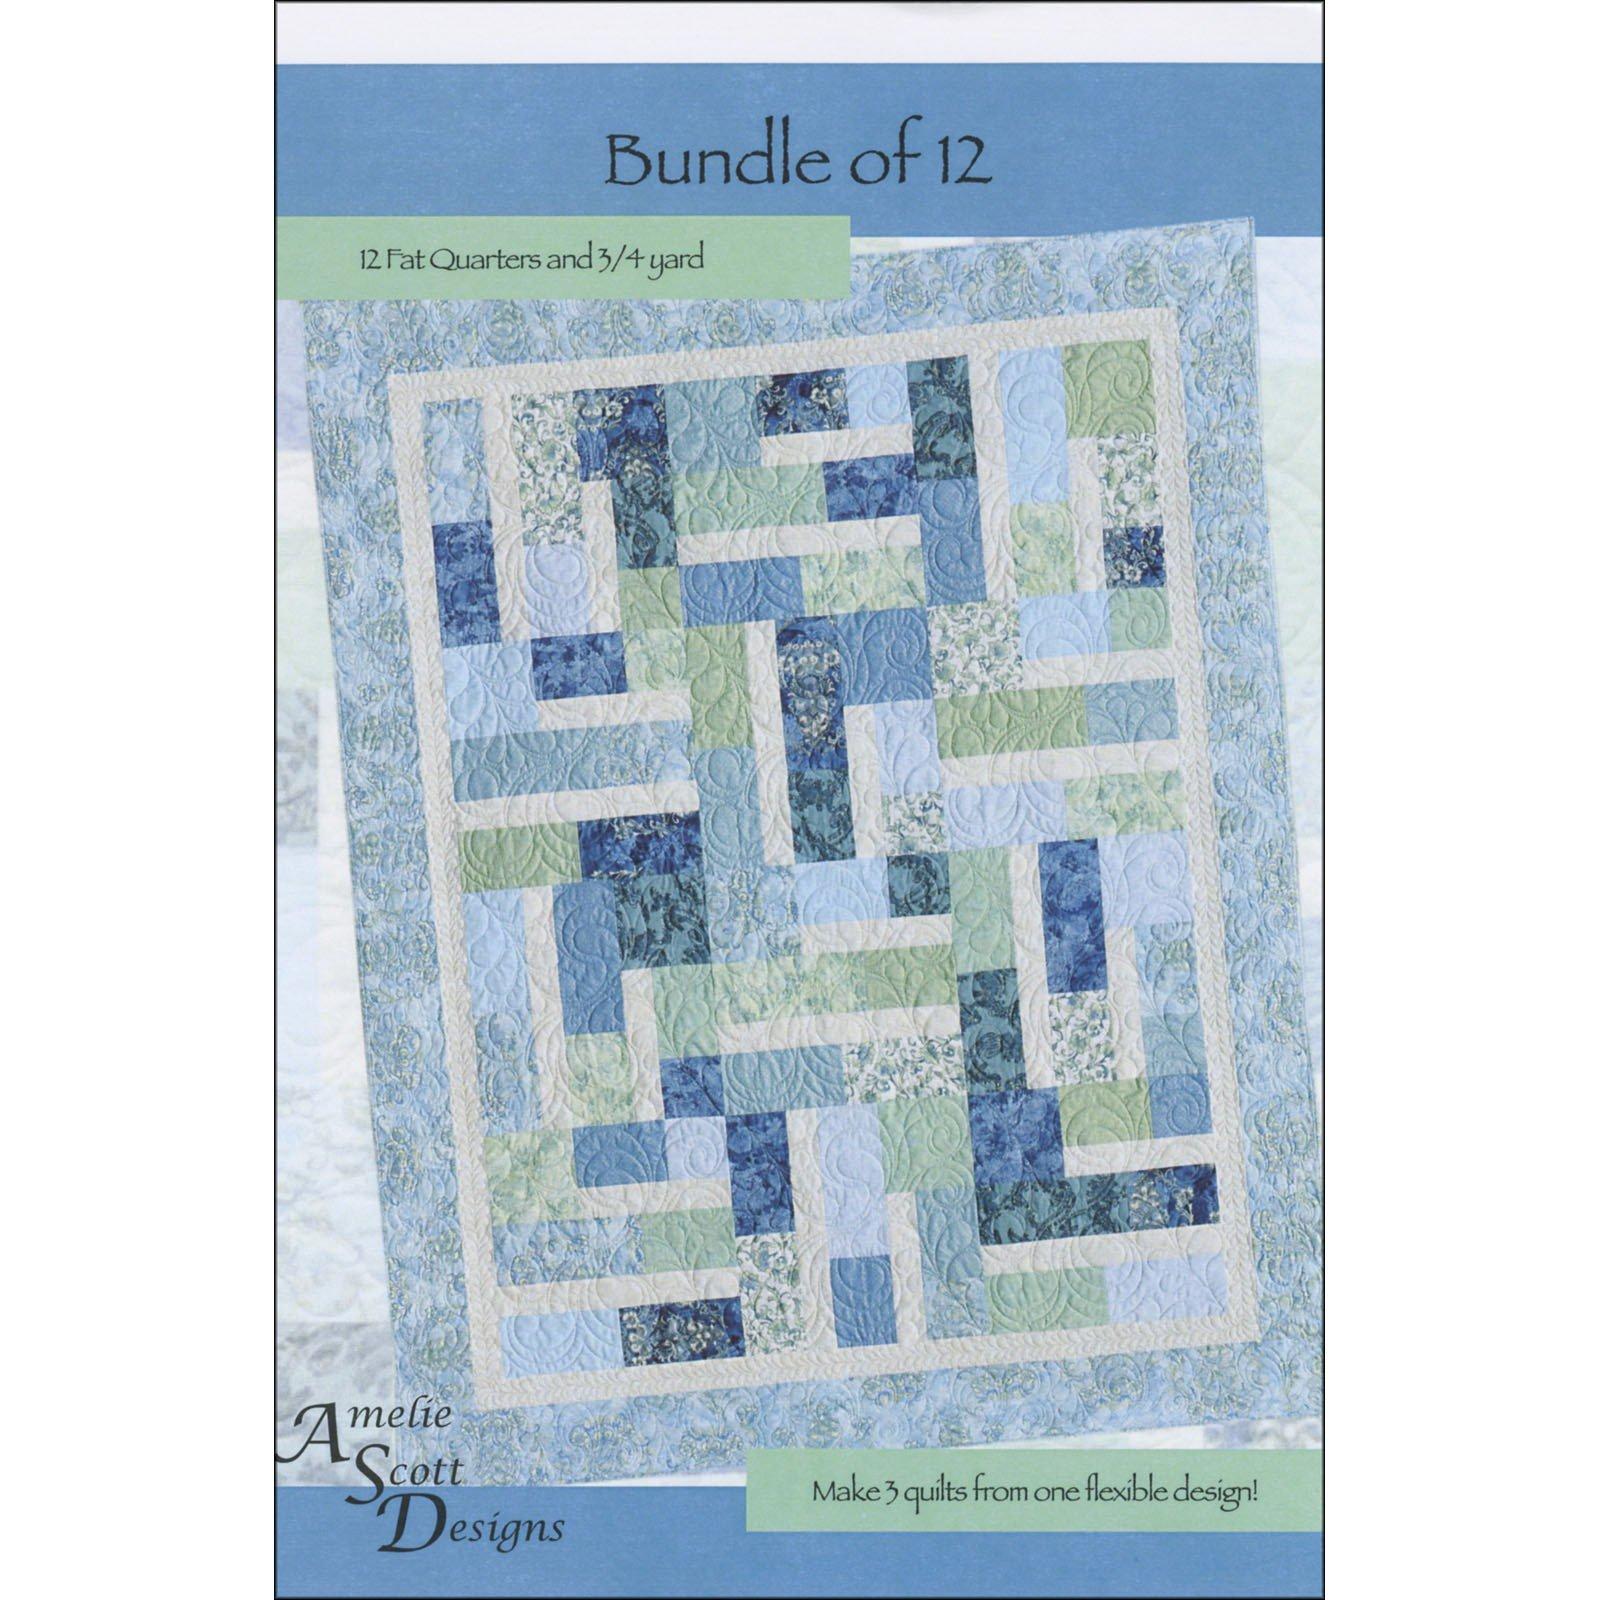 Bundle of 12 Pattern